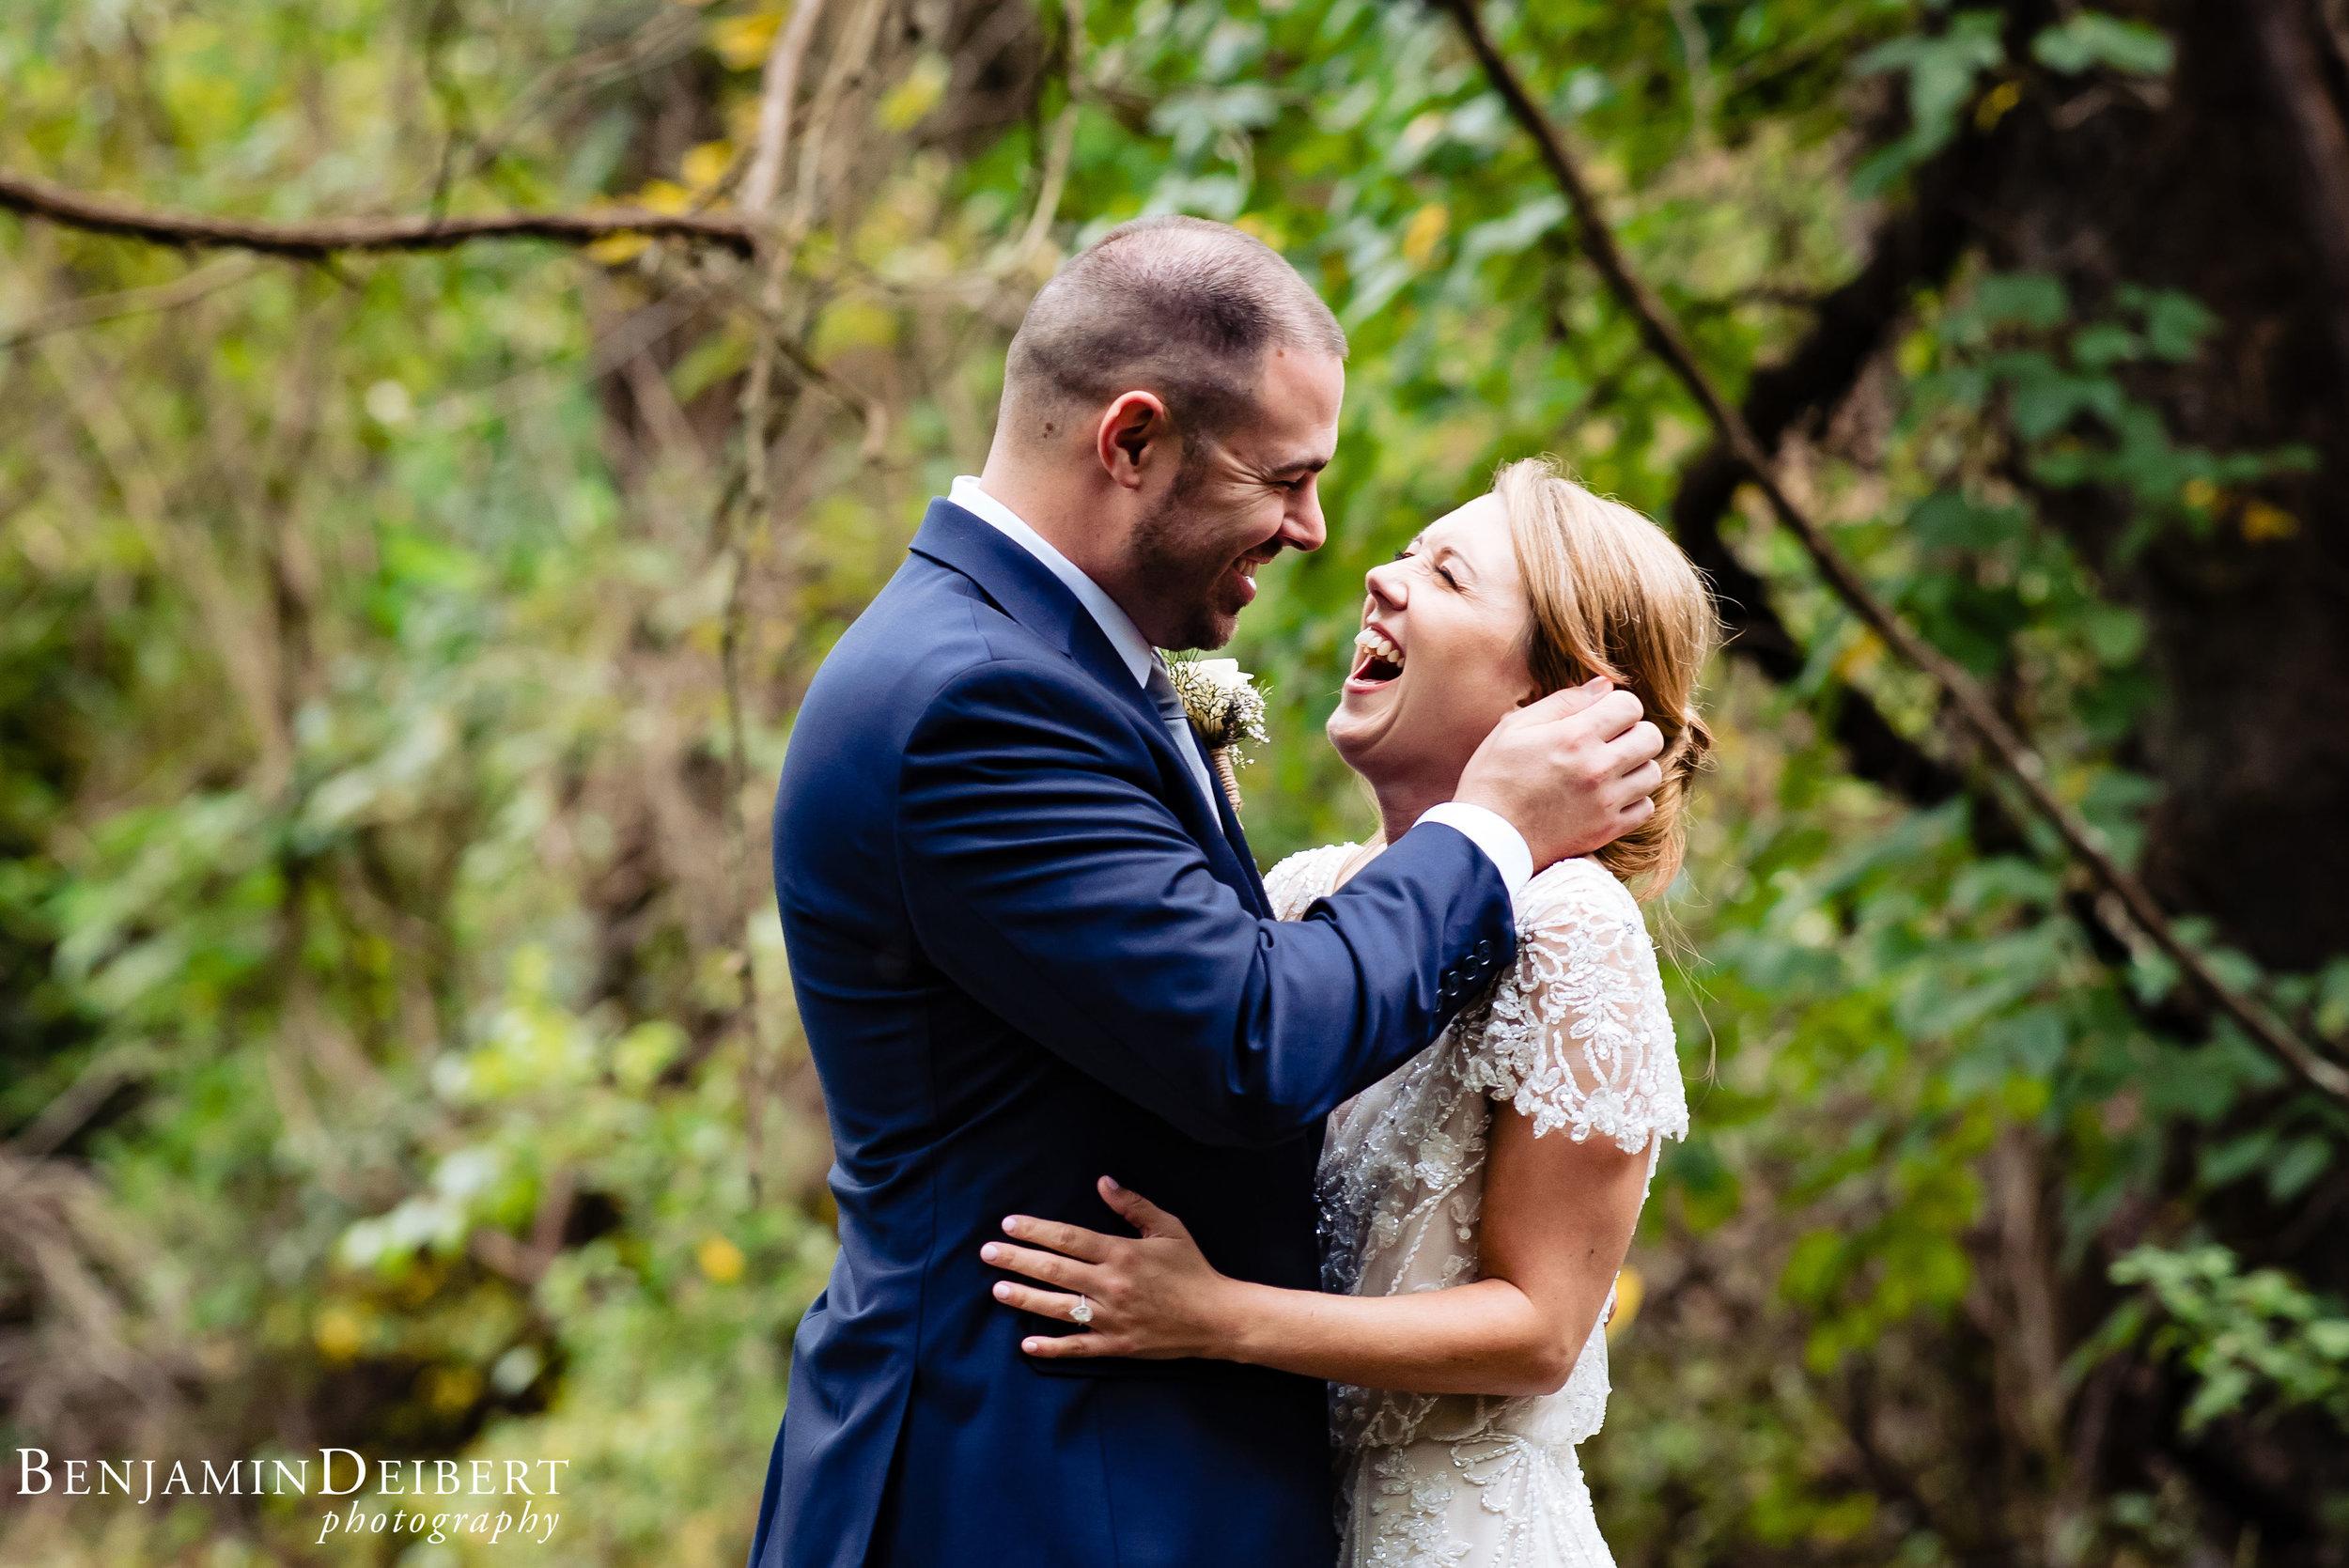 AllisonandMatt_BradfordEstate_Wedding-2.jpg